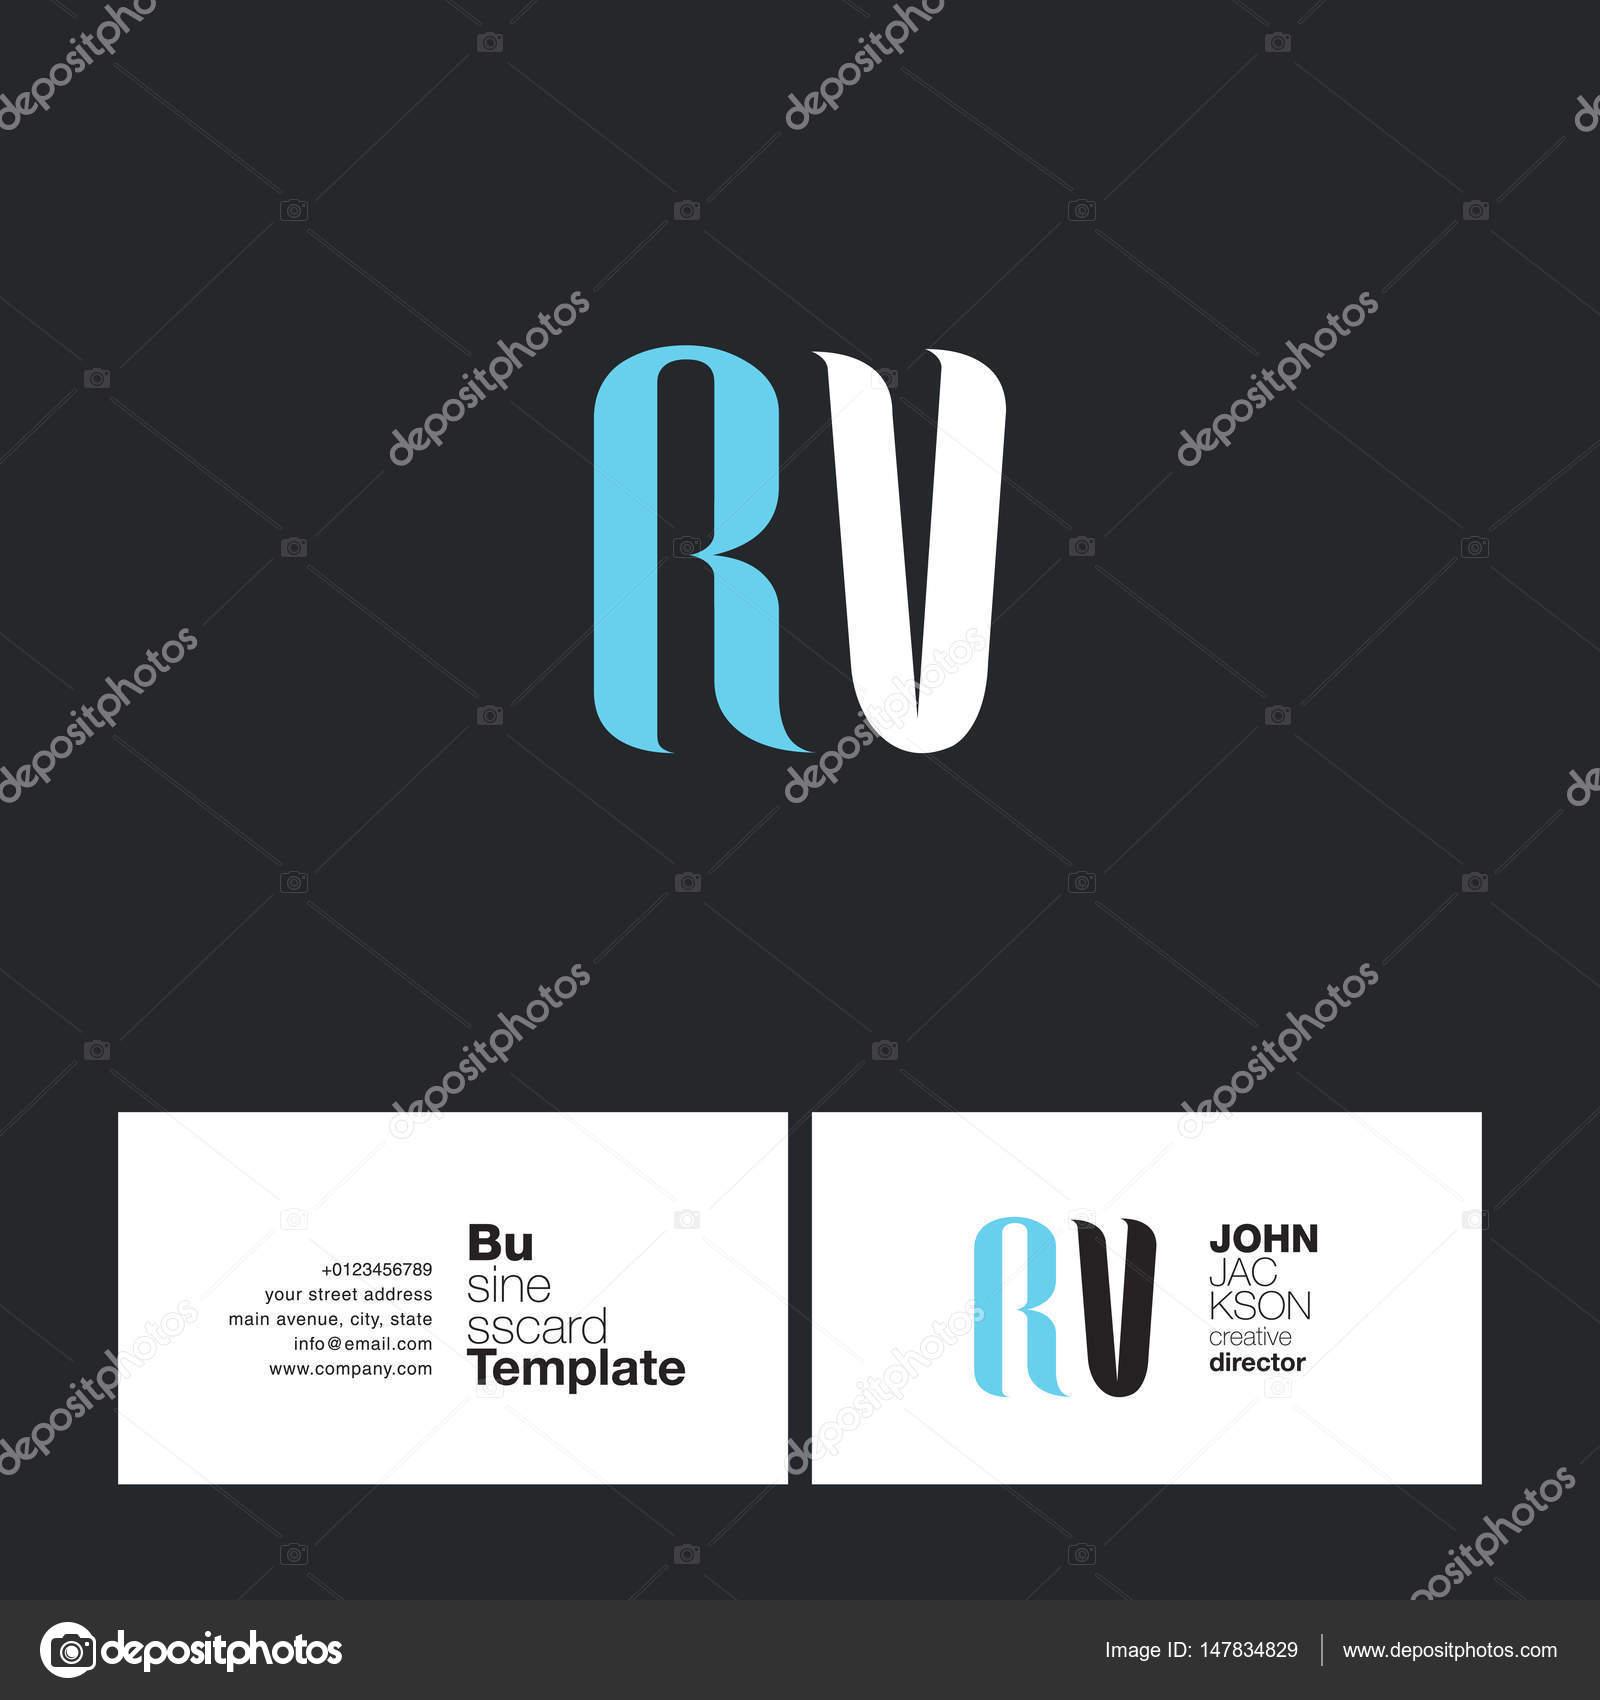 Rv letters logo business card stock vector brainbistro 147834829 rv letters logo business card stock vector colourmoves